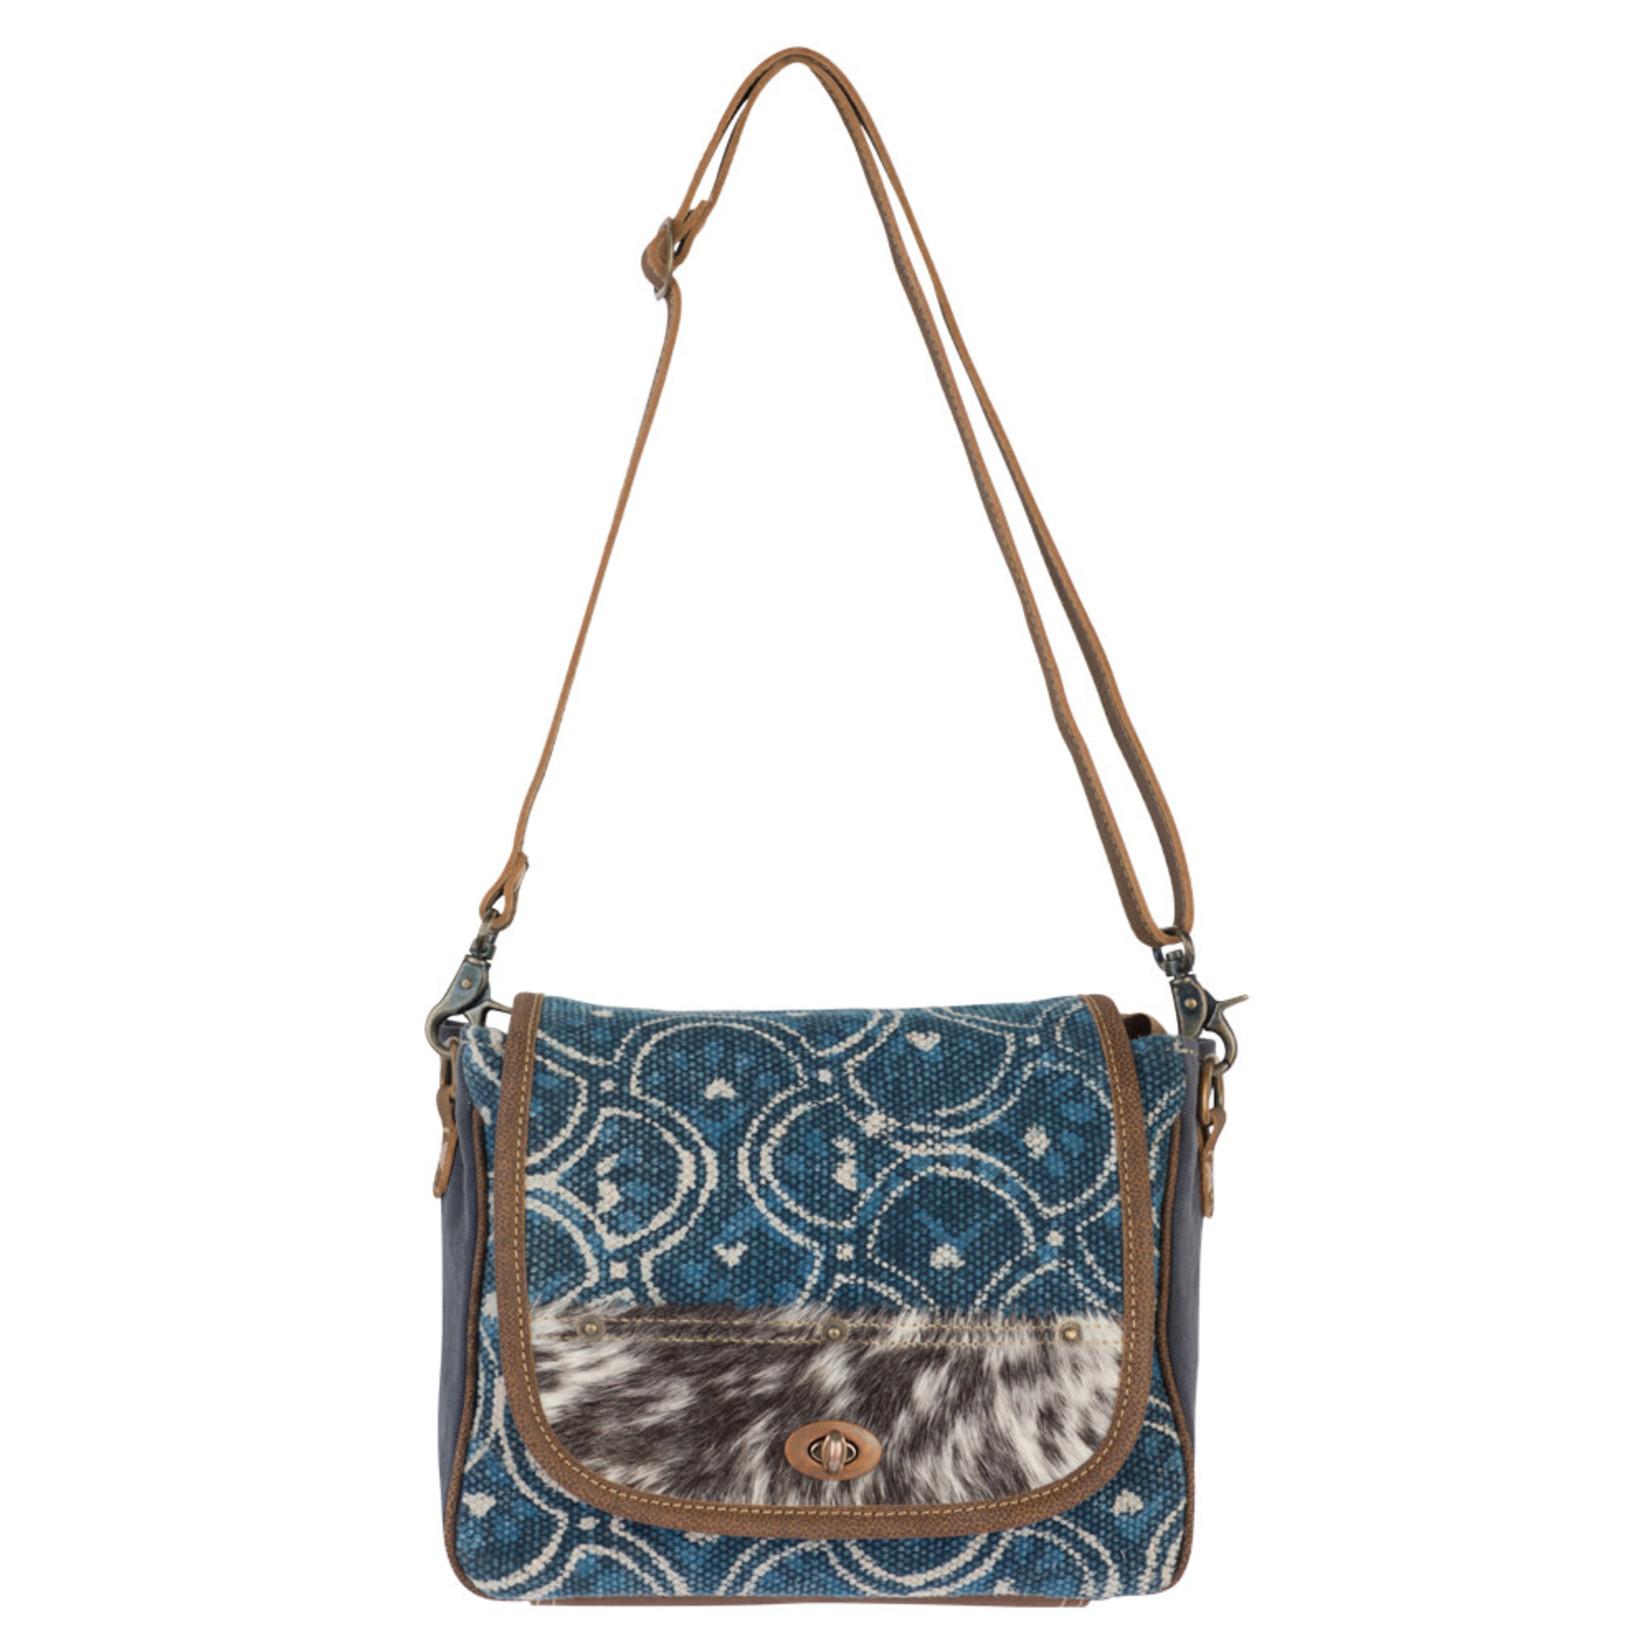 Myra Bags S-2236 Cobalt Shoulder Bag